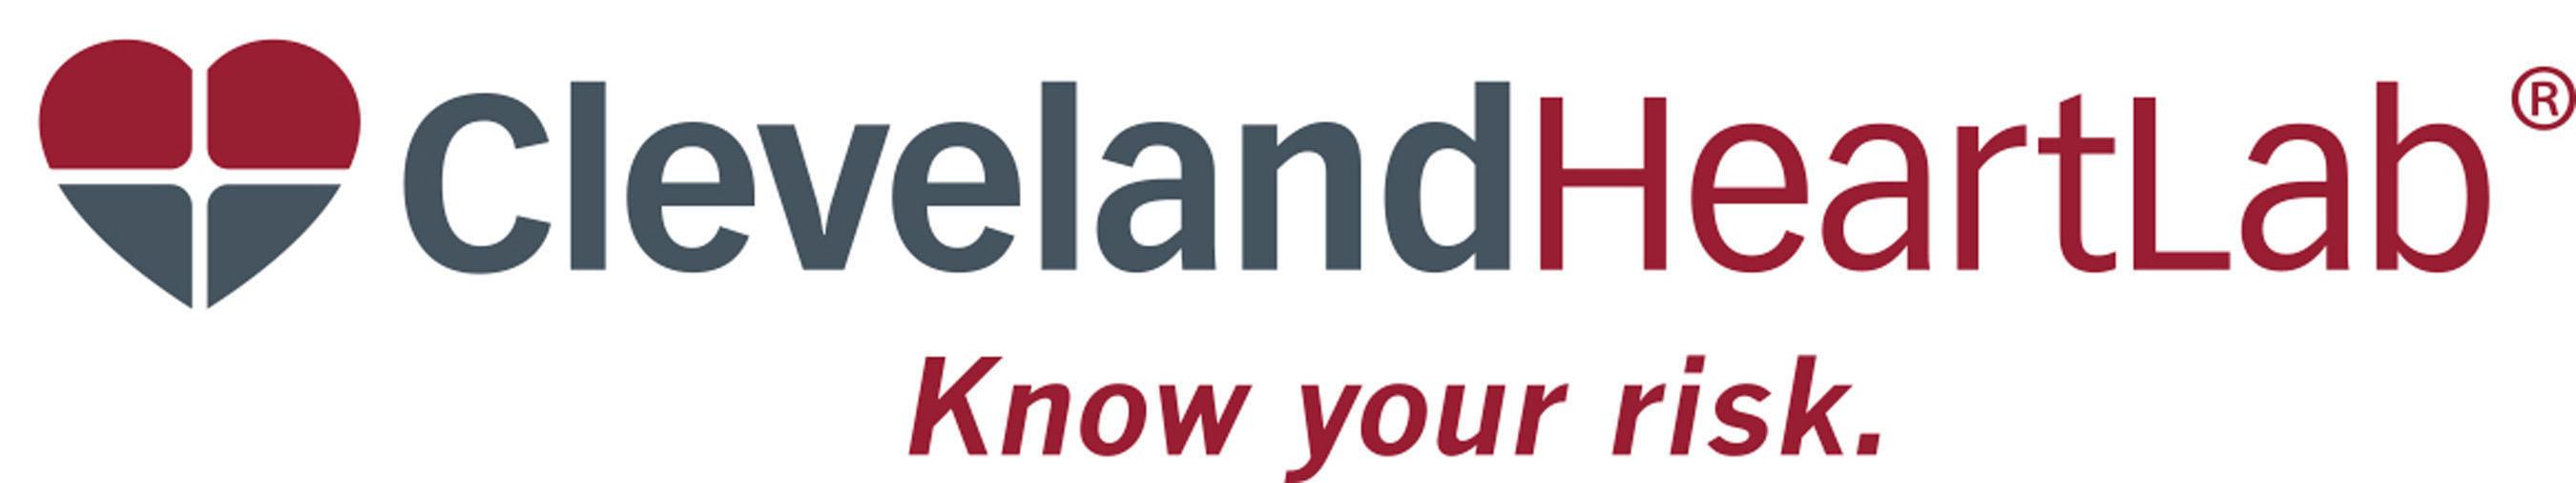 http://www.clevelandheartlab.com/